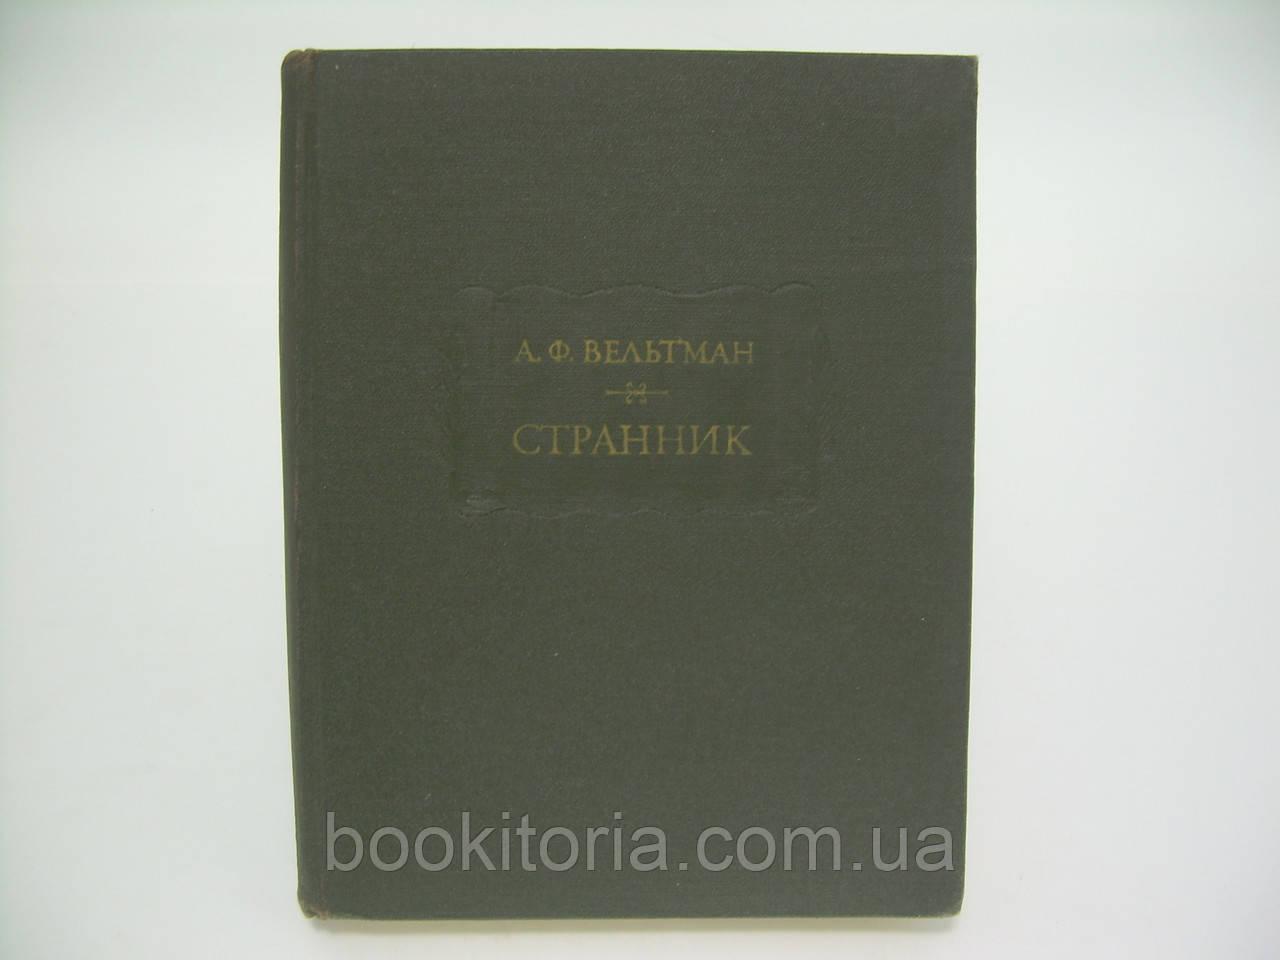 Вельтман А.Ф. Странник (б/у).